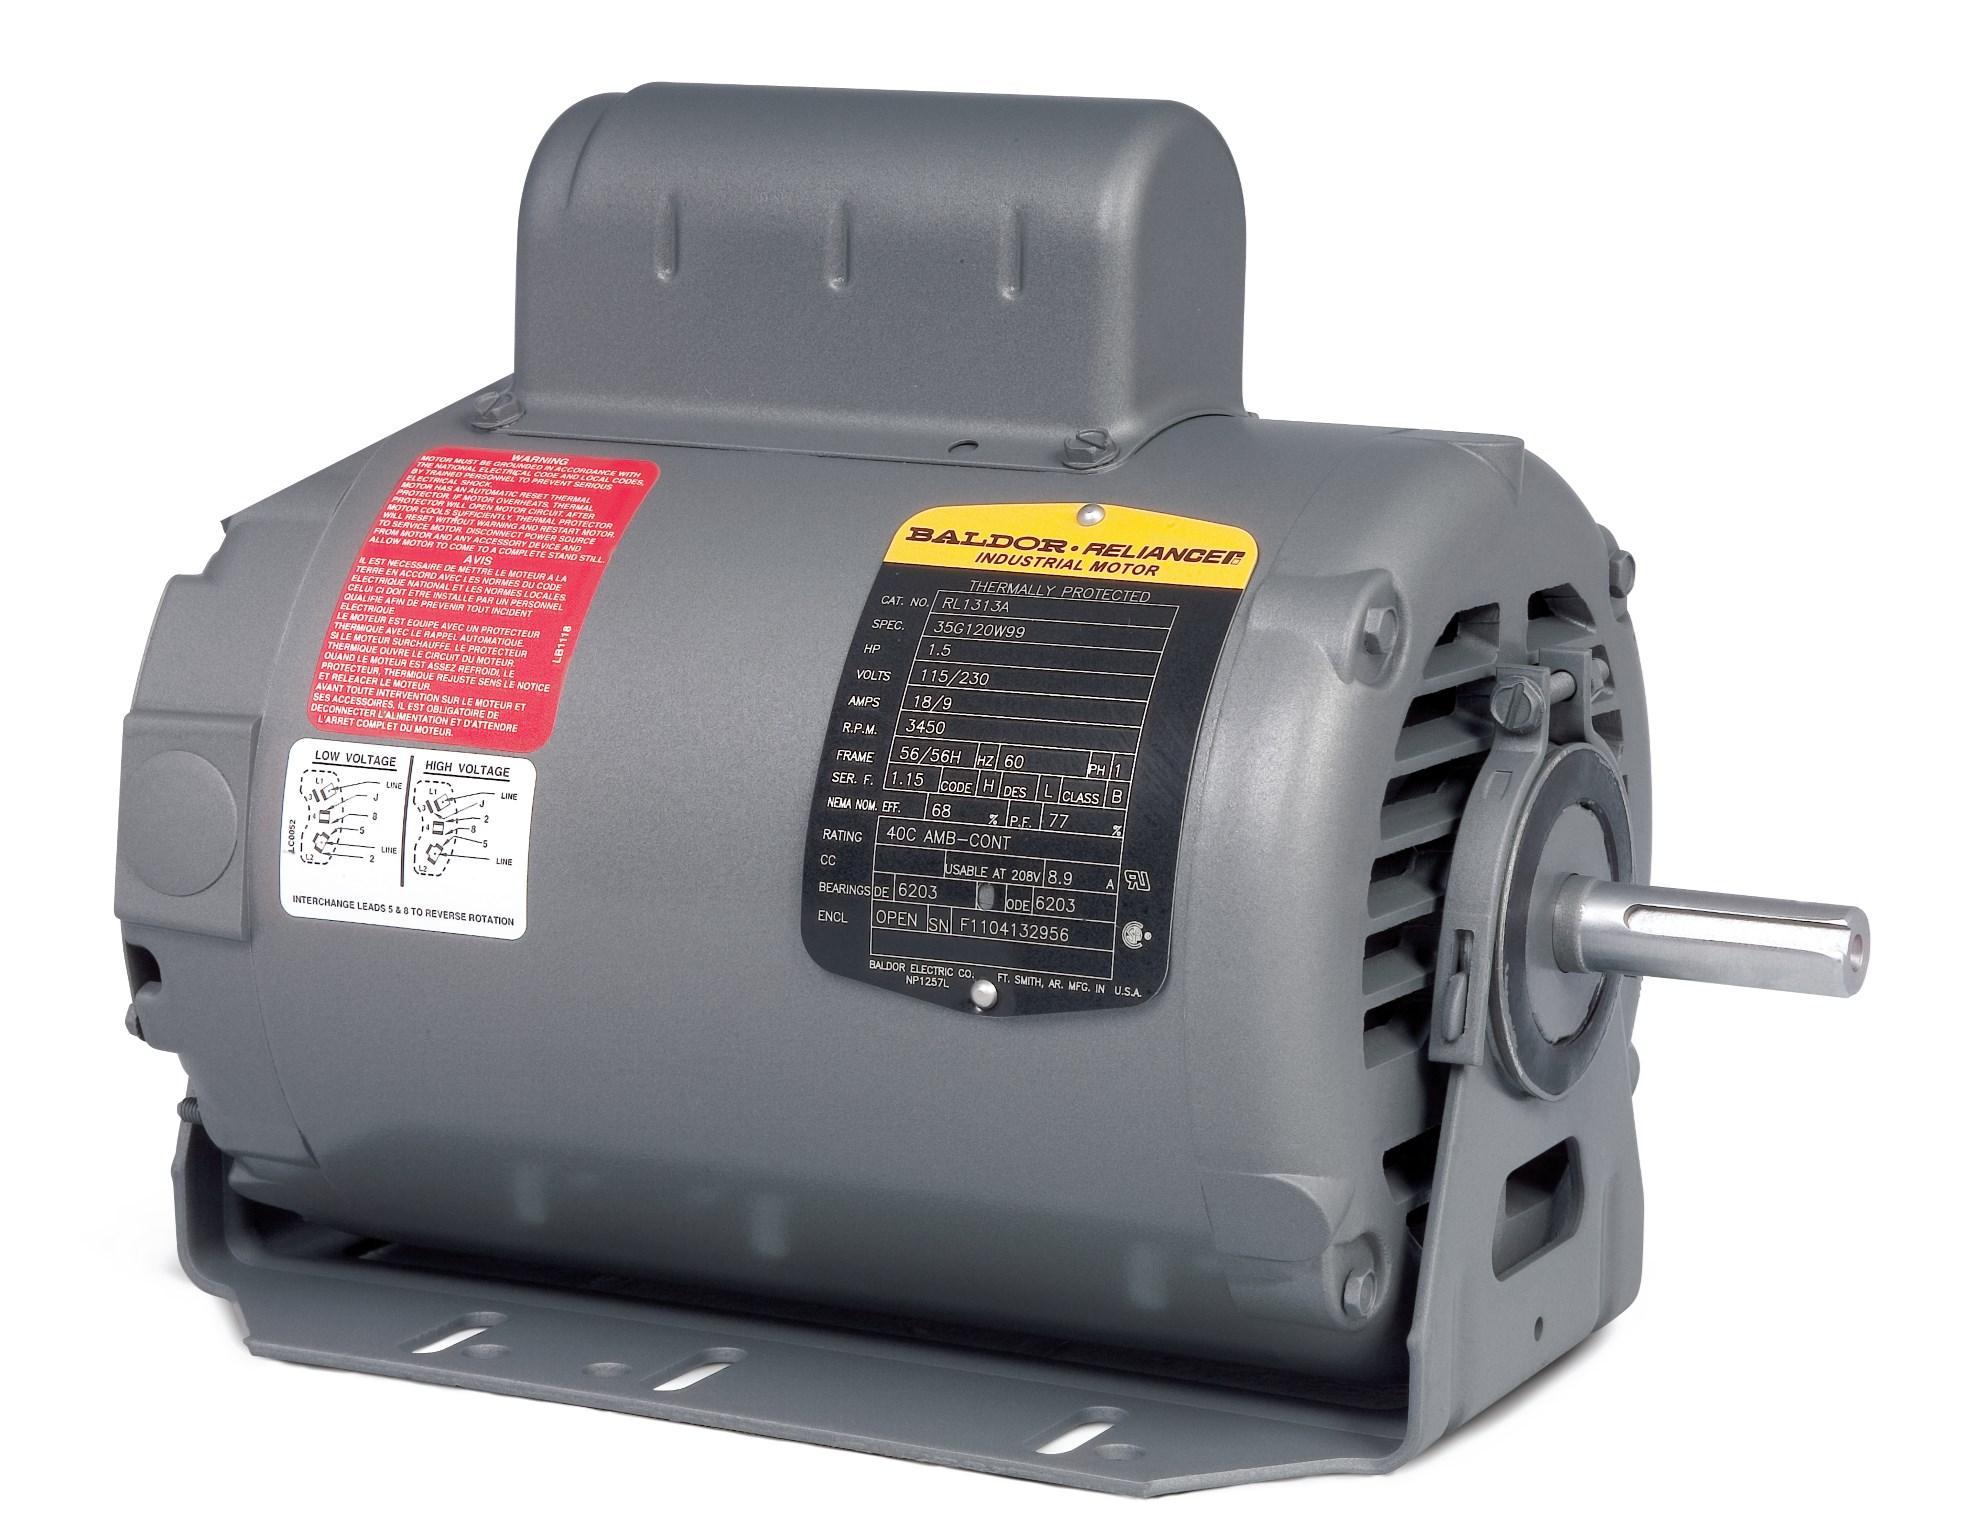 Baldor 115 230 Reverse Motor Wiring Trusted Diagrams For Motors Diagram Vl3504 House Symbols U2022 Carrier